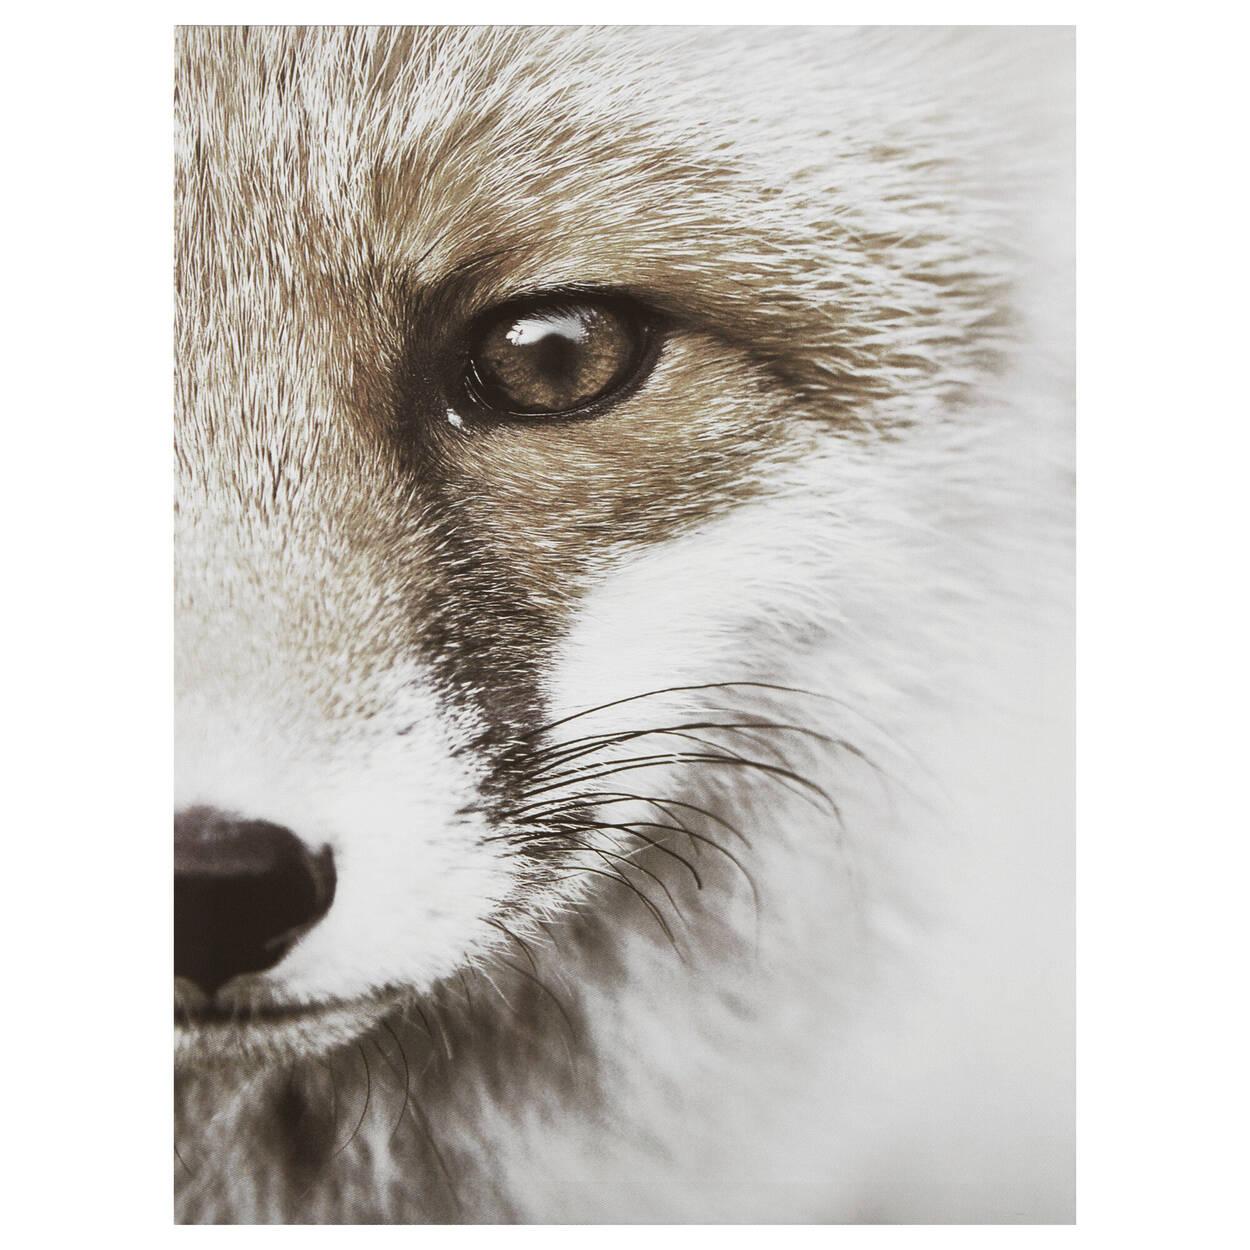 Tableau imprimé renard en gros plan